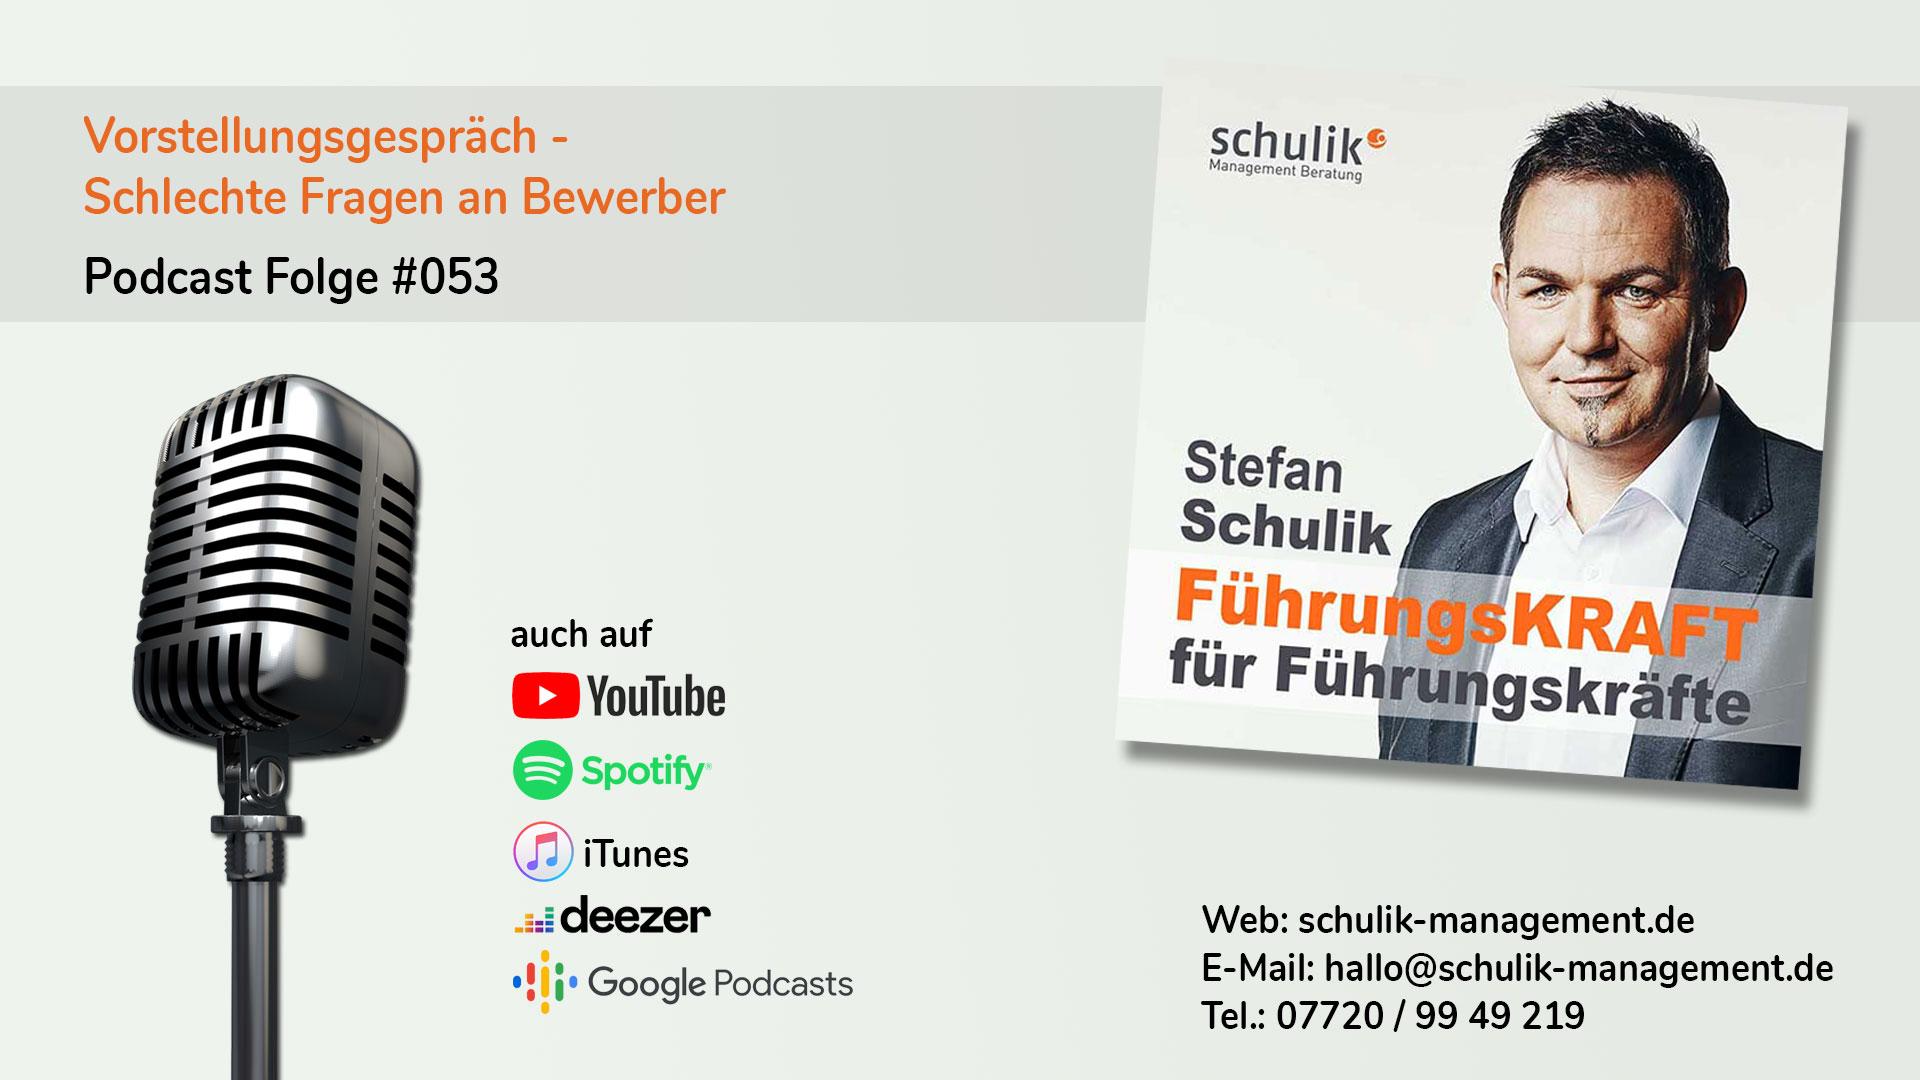 Vorstellungsgespräch, Fragen An Bewerber – Podcast Folge #053